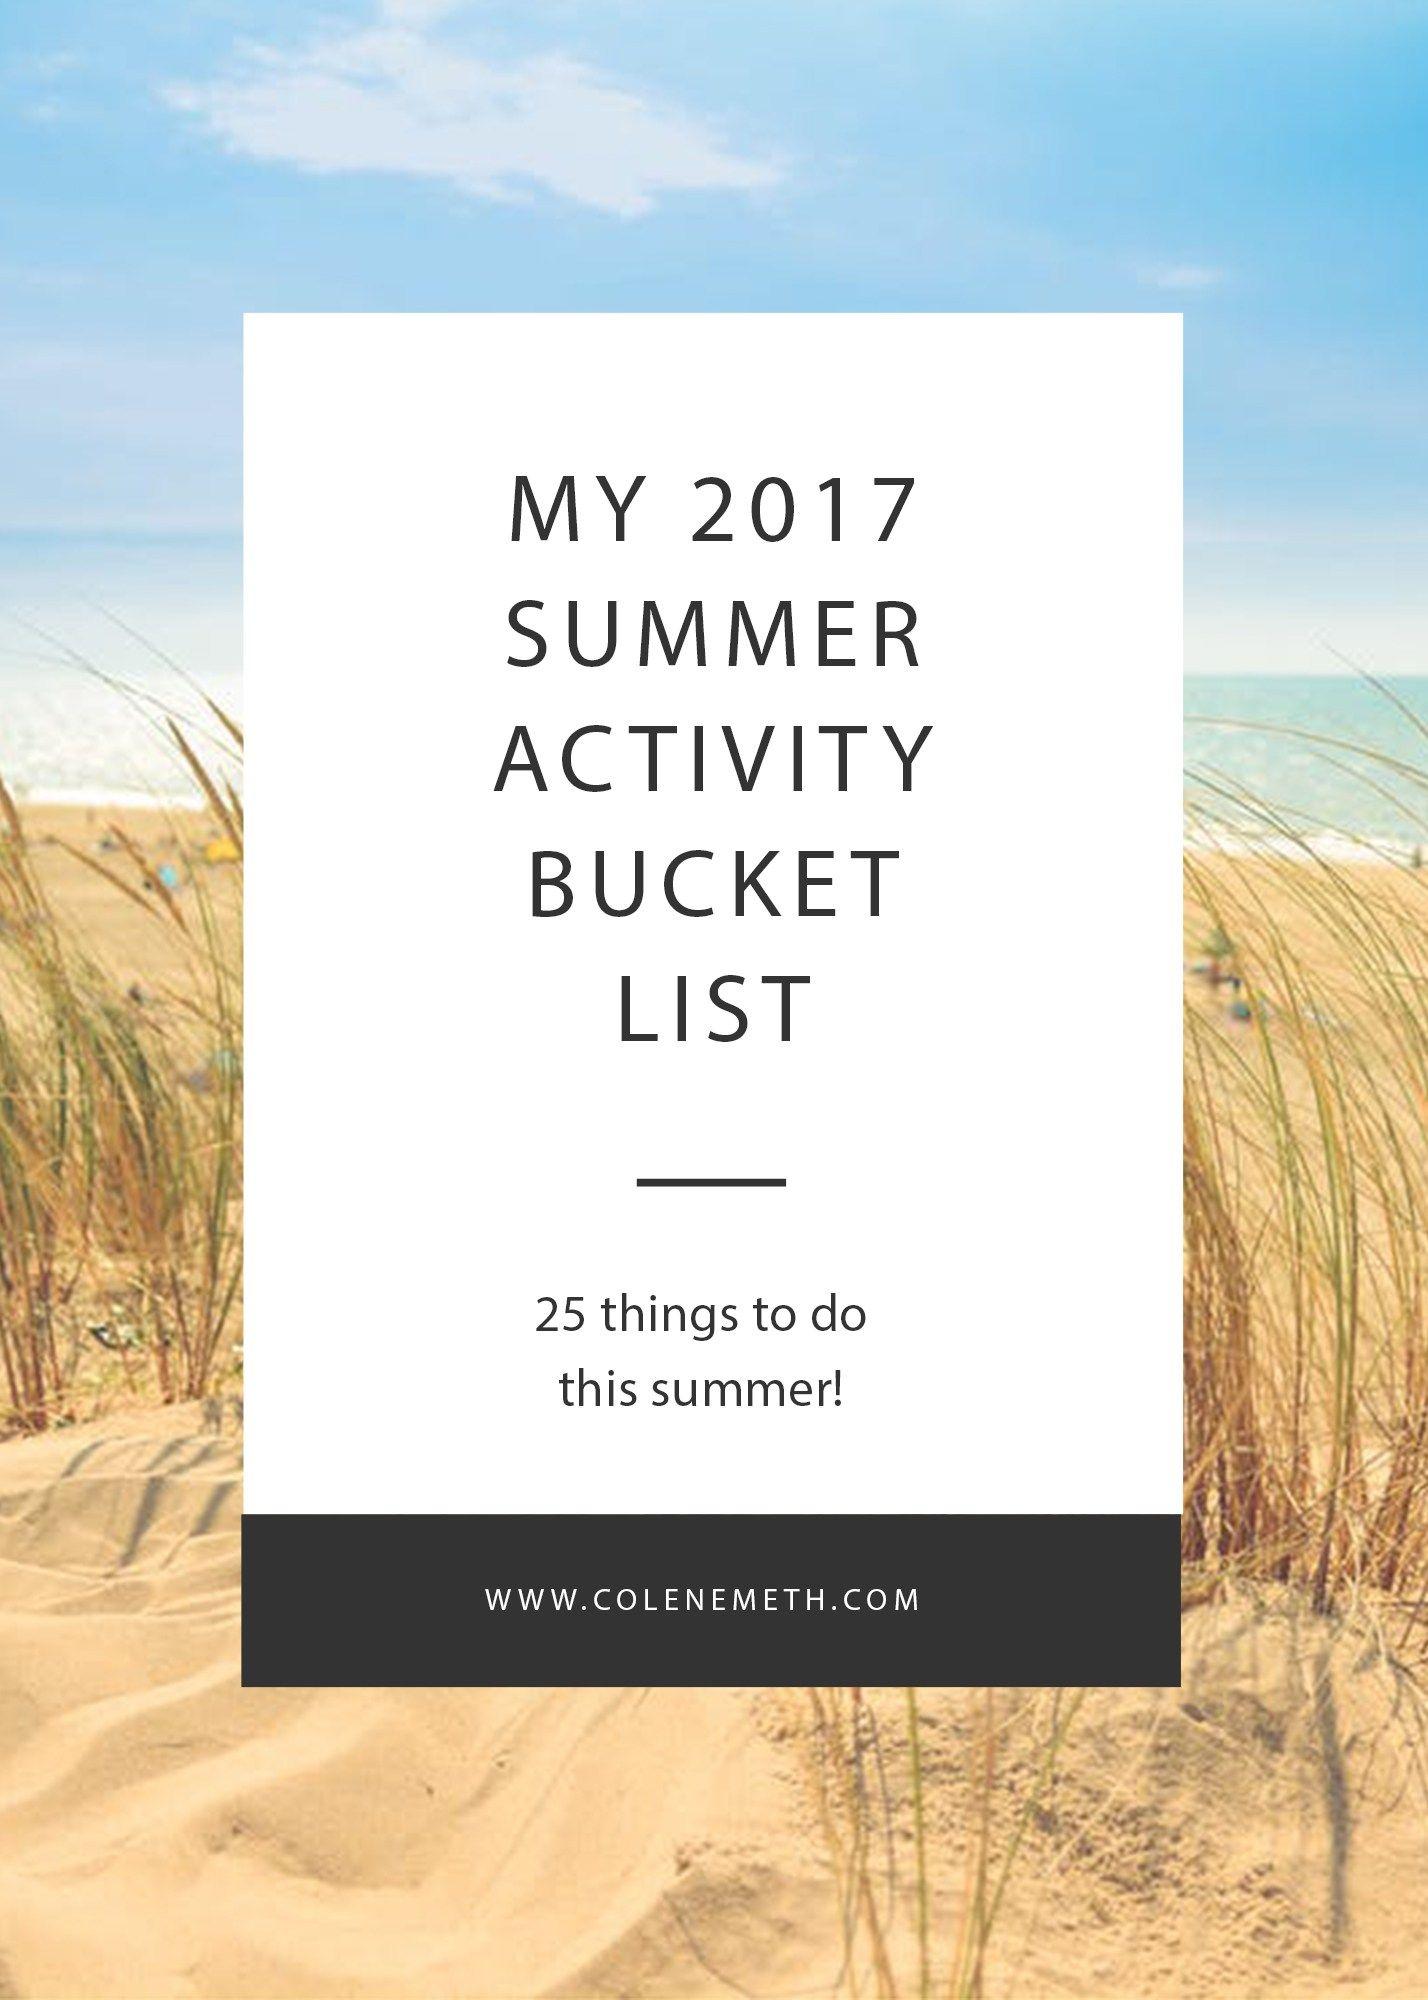 My Summer Activity Bucket List